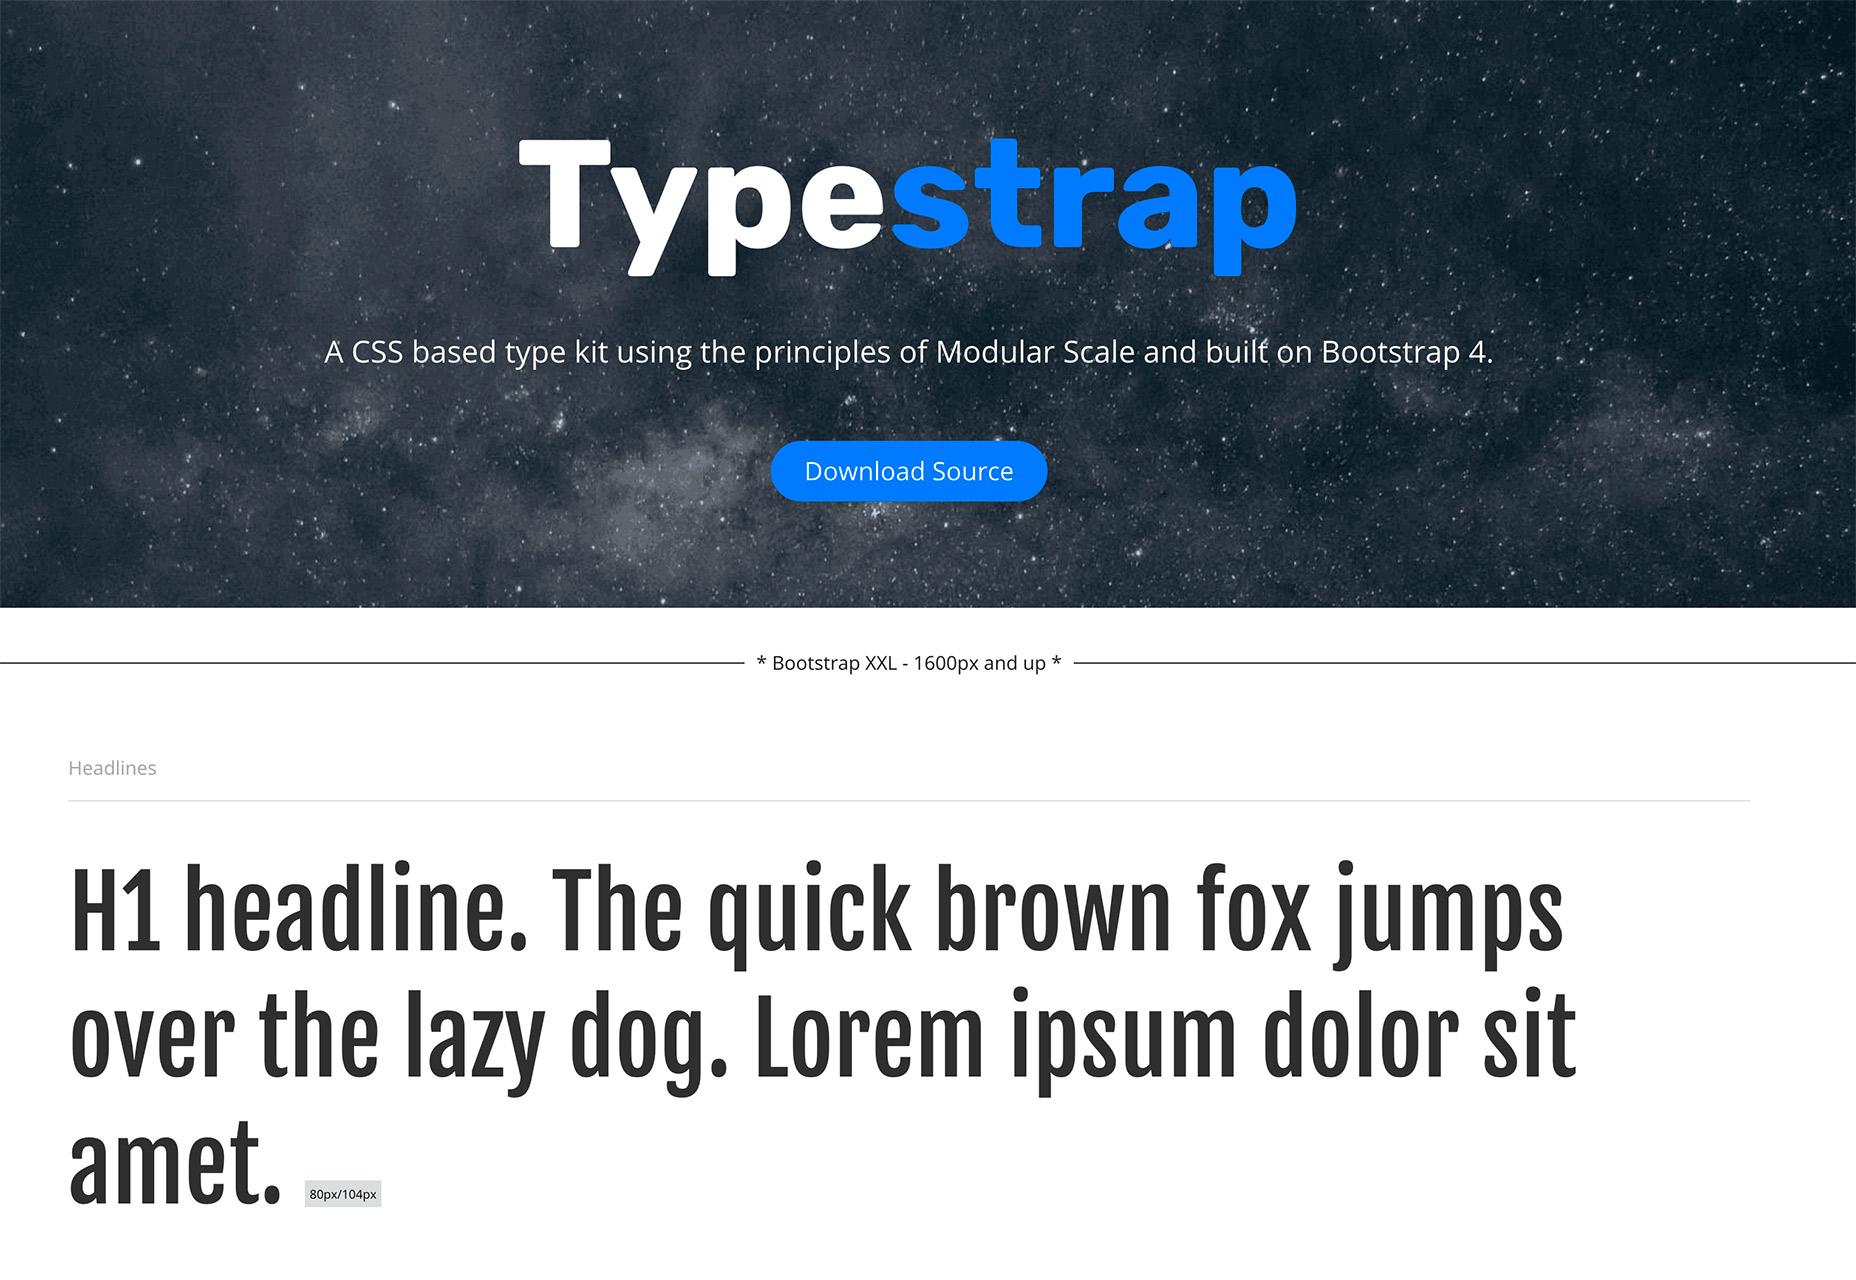 typestrap